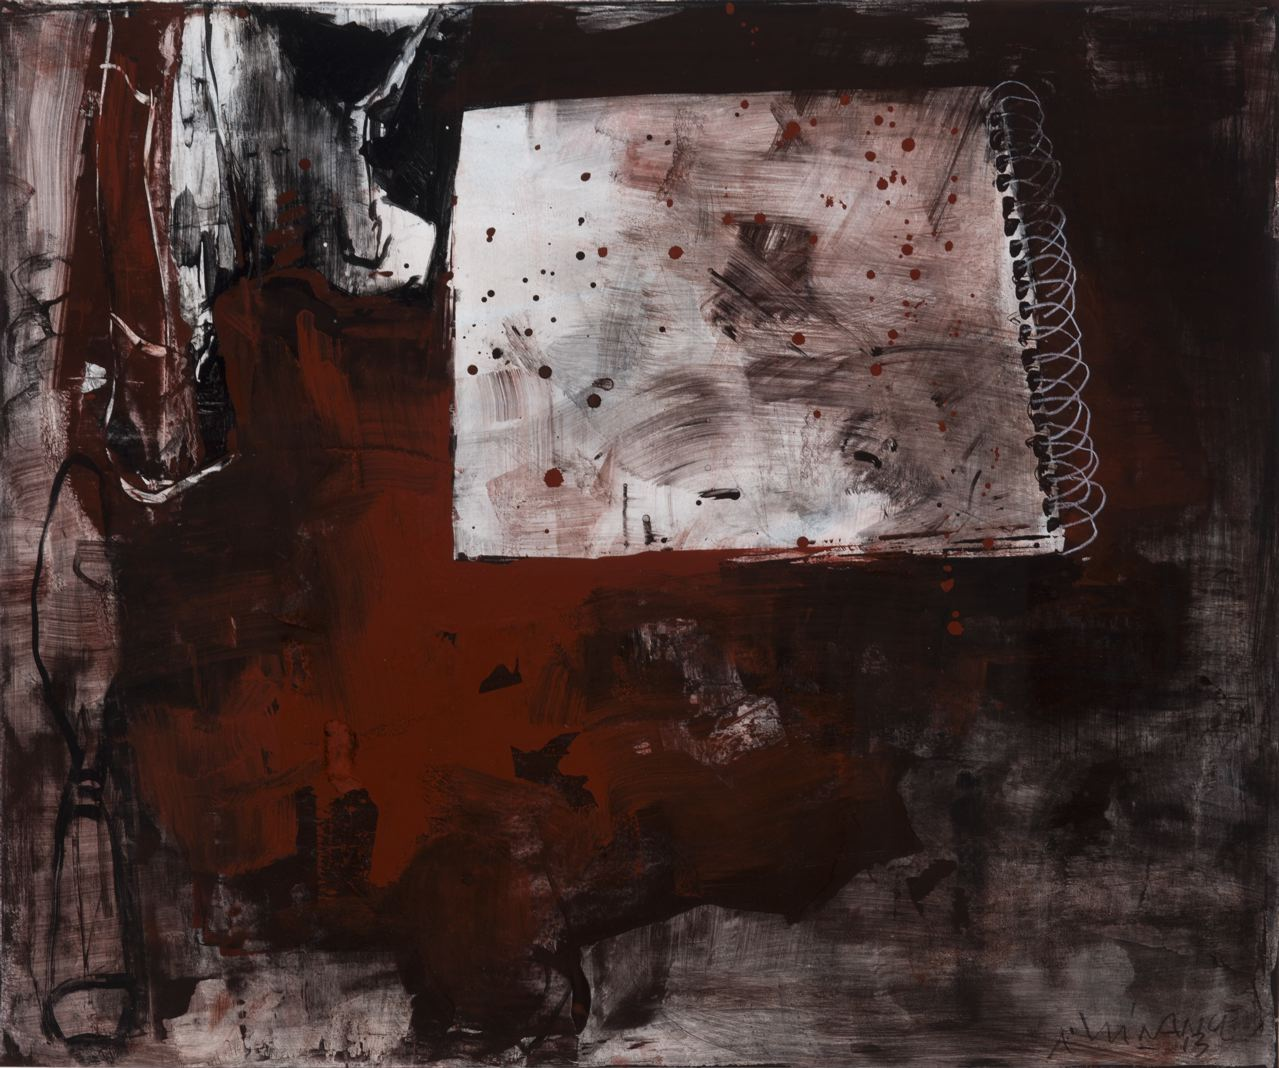 La-page-blanche-III-2014-encre-s-papier-57x67-